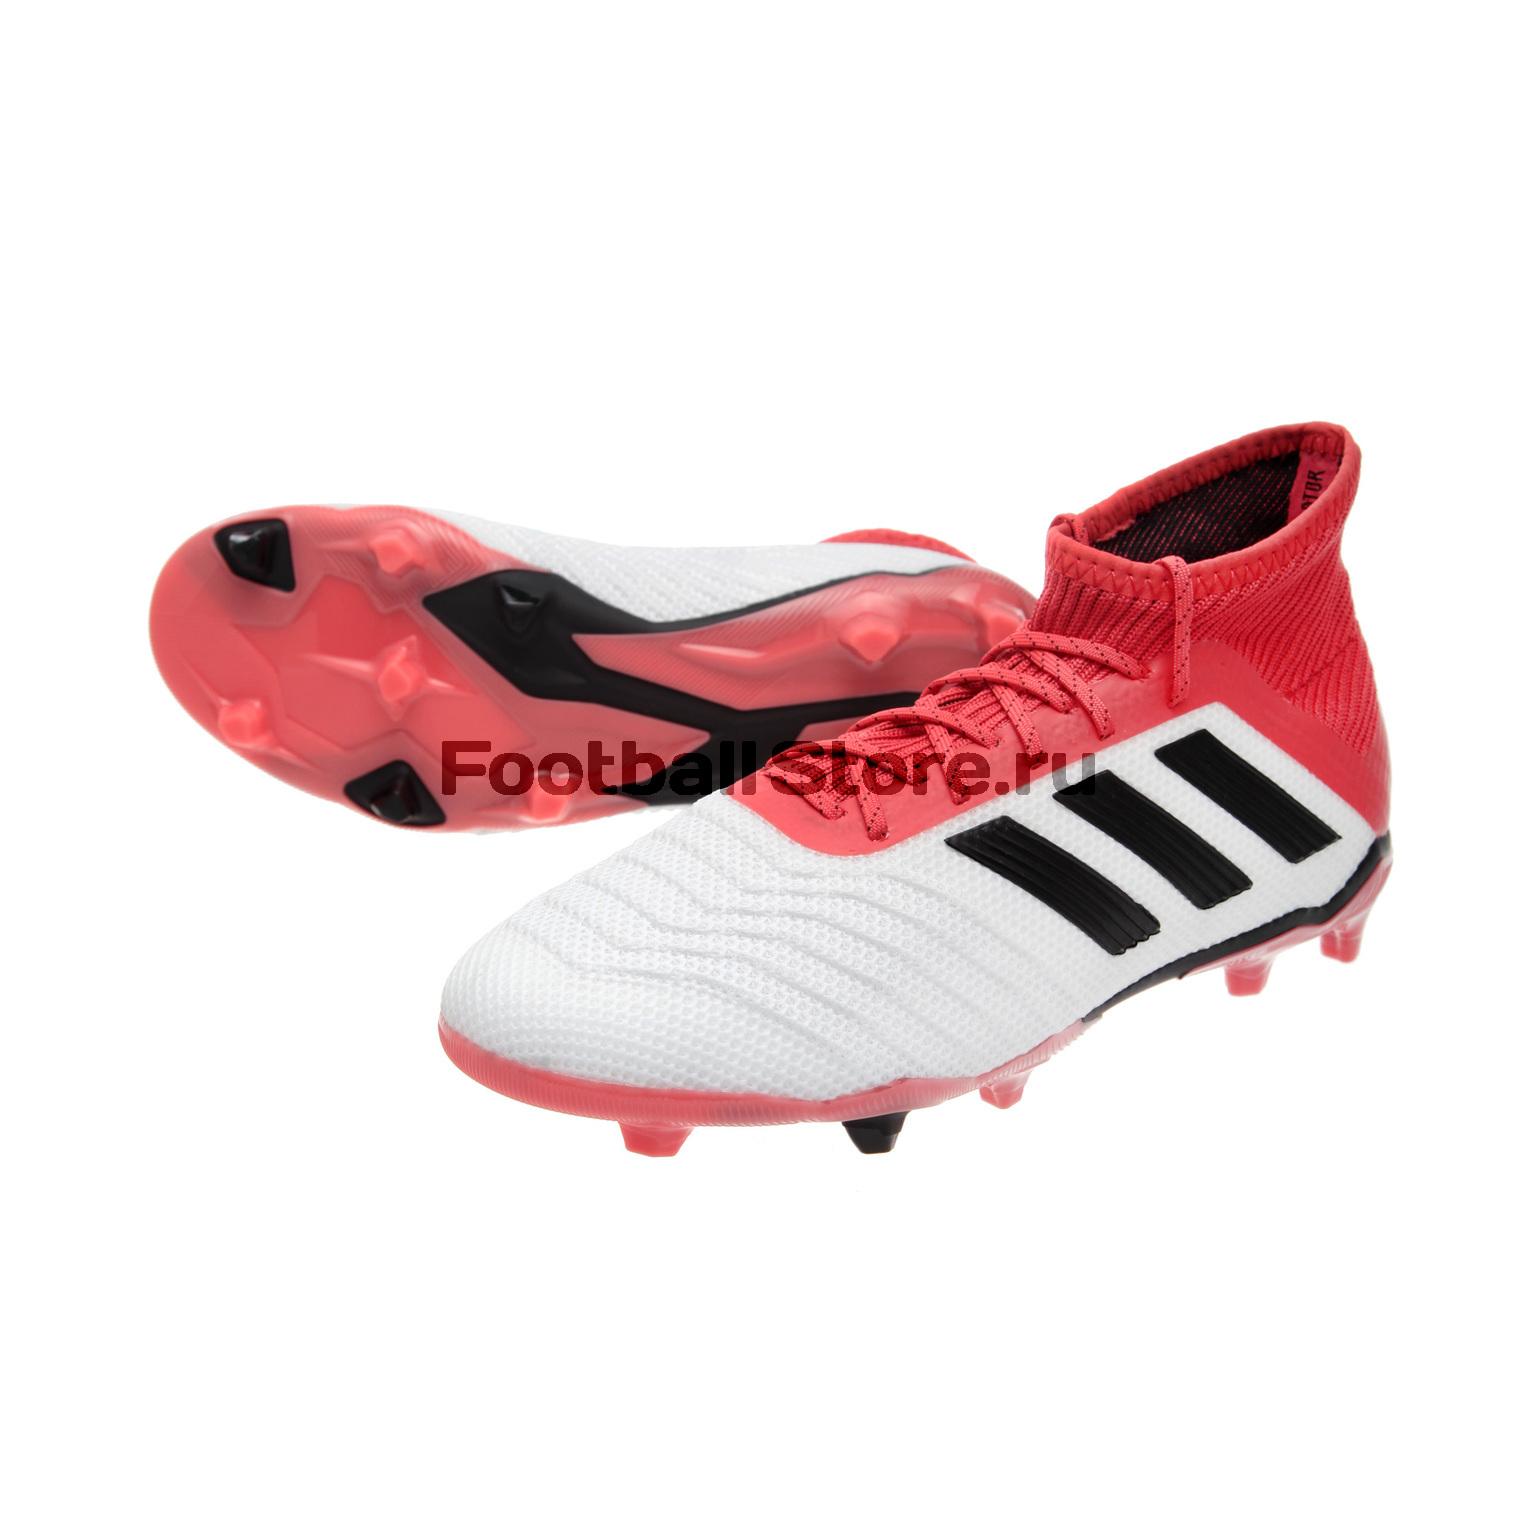 Бутсы Adidas Predator 18.1 FG JR CP8873 adidas predator junior gk glove